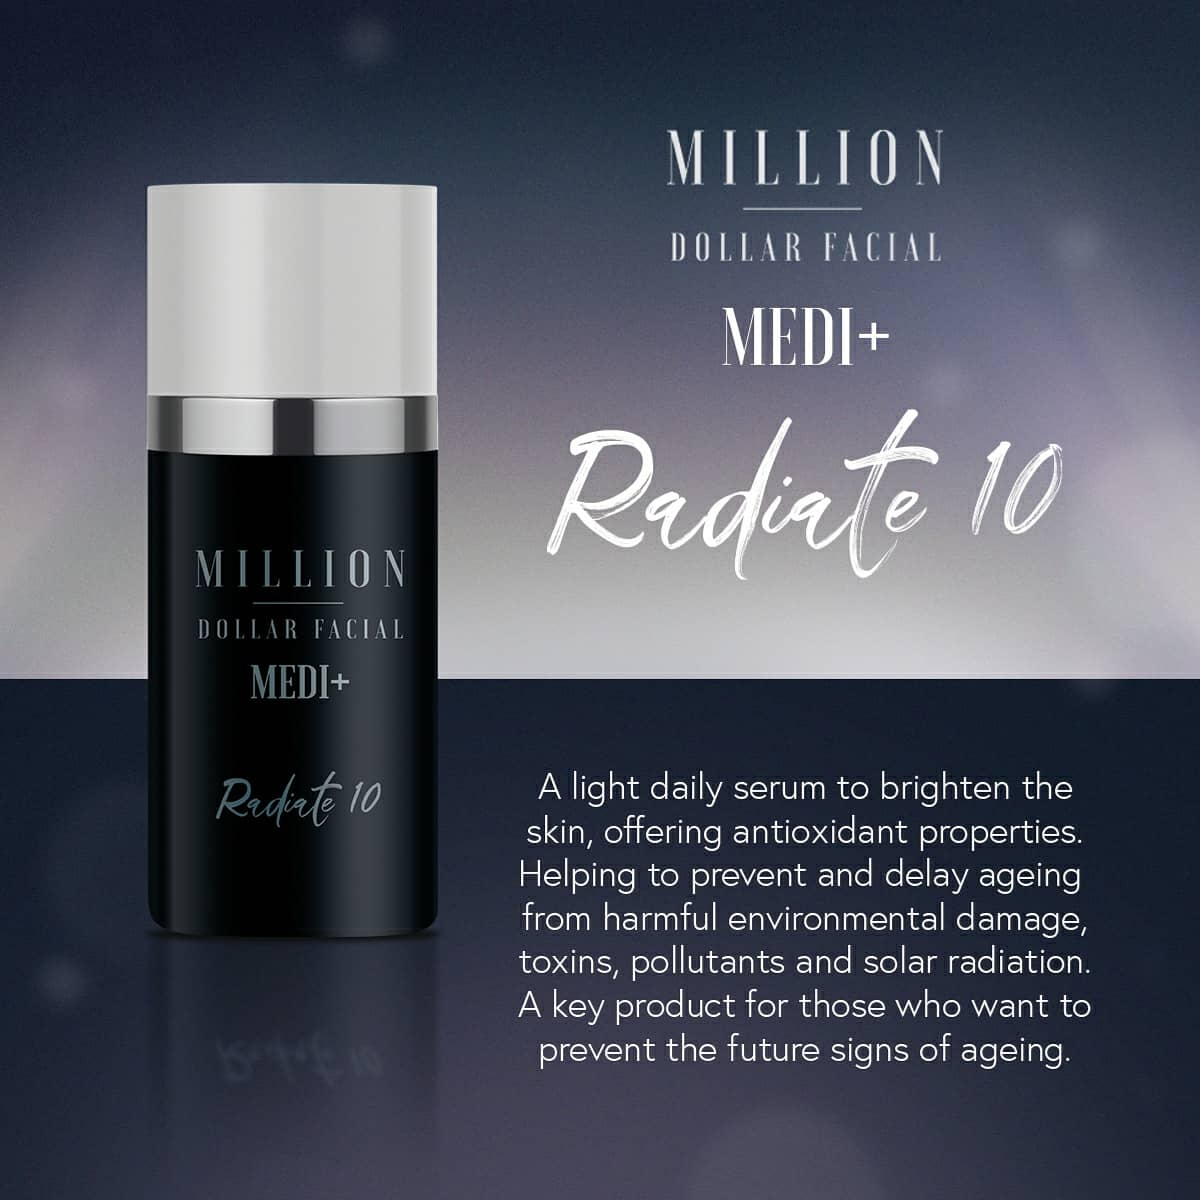 Million Dollar Facial Medi+ Radiate 10 at Uber Pigmentations